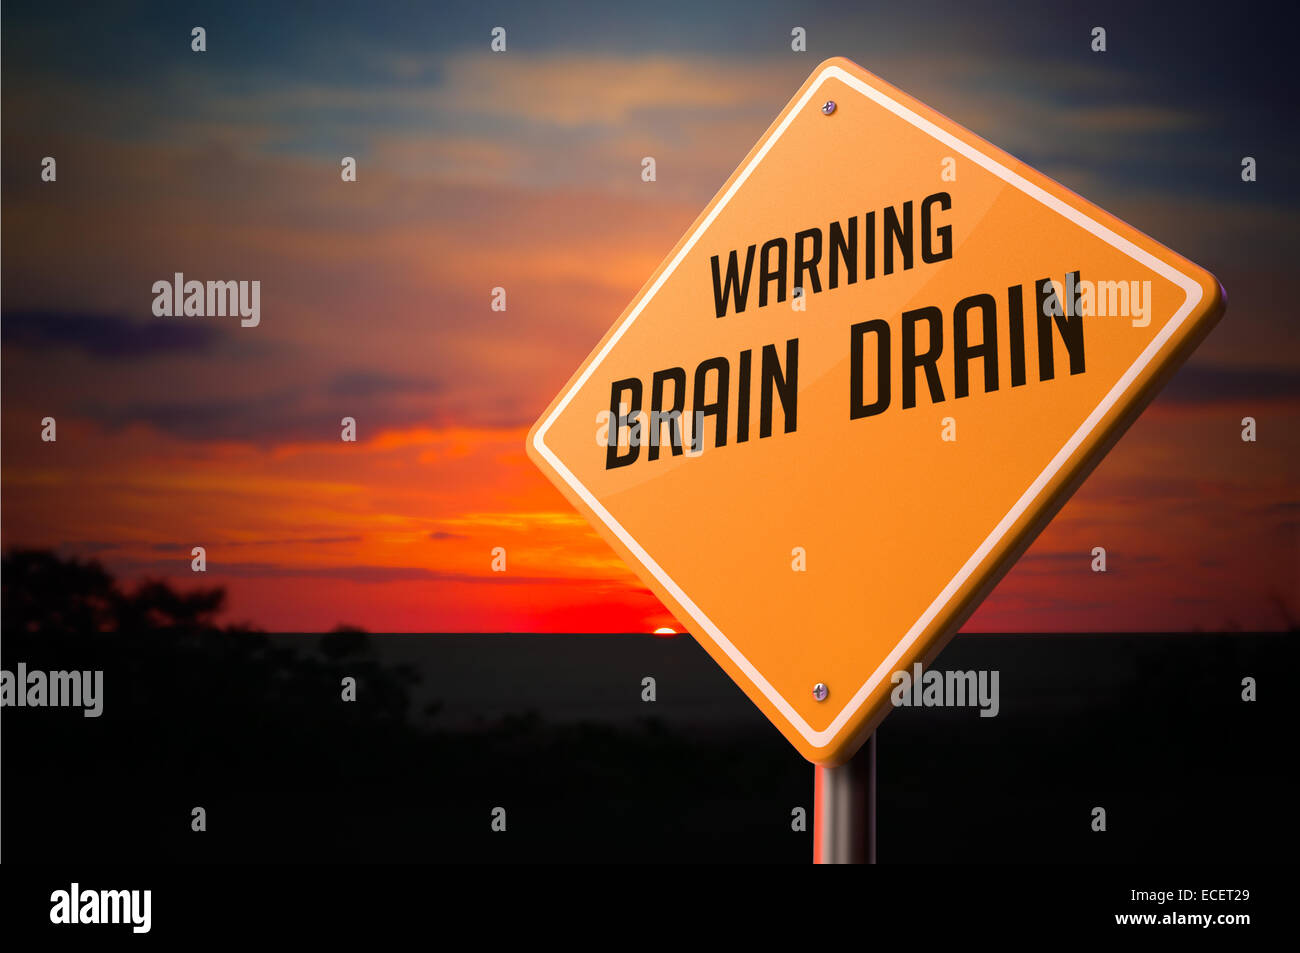 Brain Drain on Warning Road Sign. - Stock Image